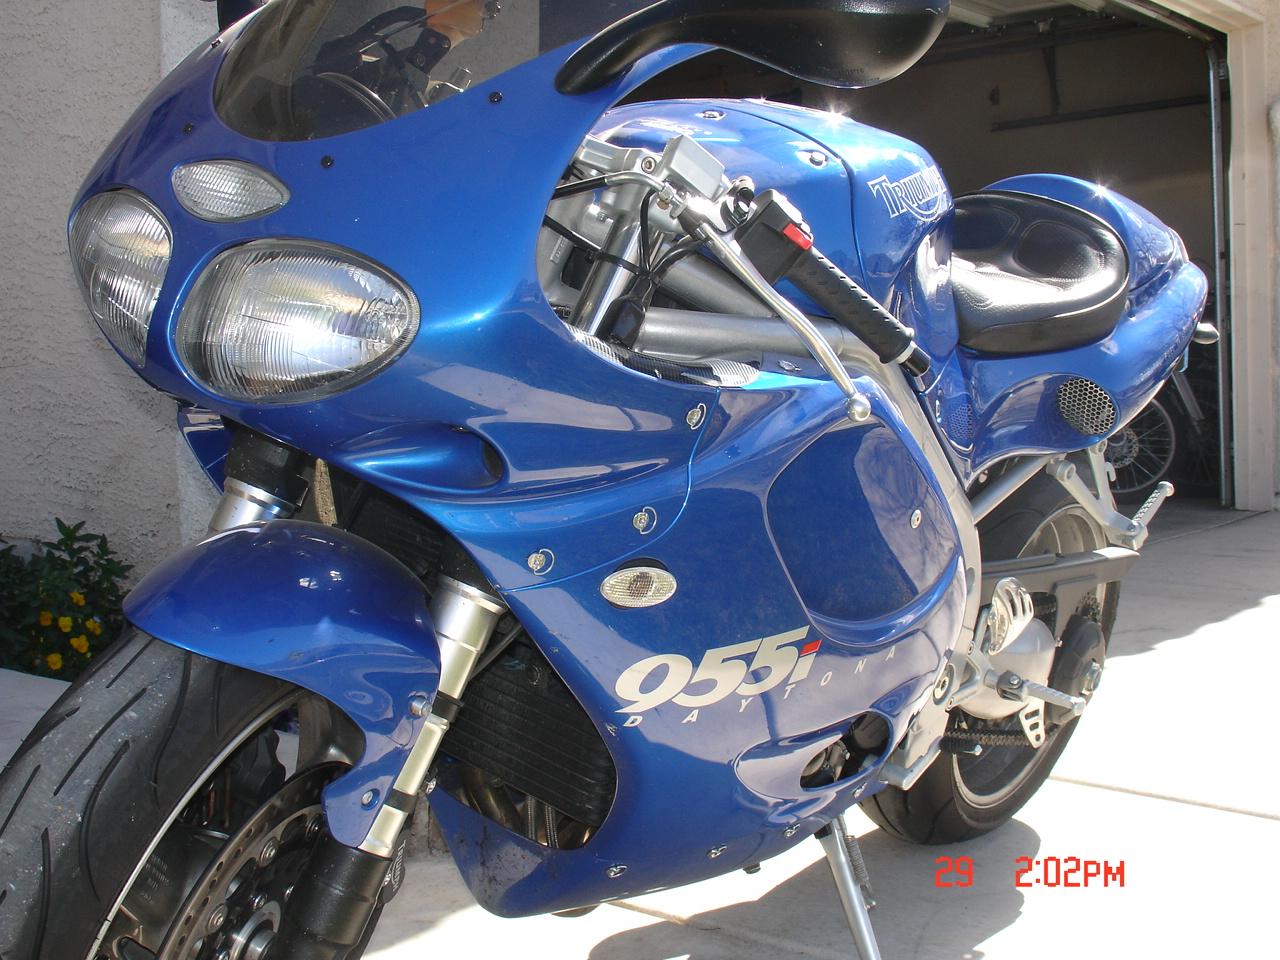 78363d1143675298 fs 2001 triumph daytona 955i daytona pics 012 forum triumph daytona 955i id�e d'image de moto triumph daytona 955i fuse box at n-0.co